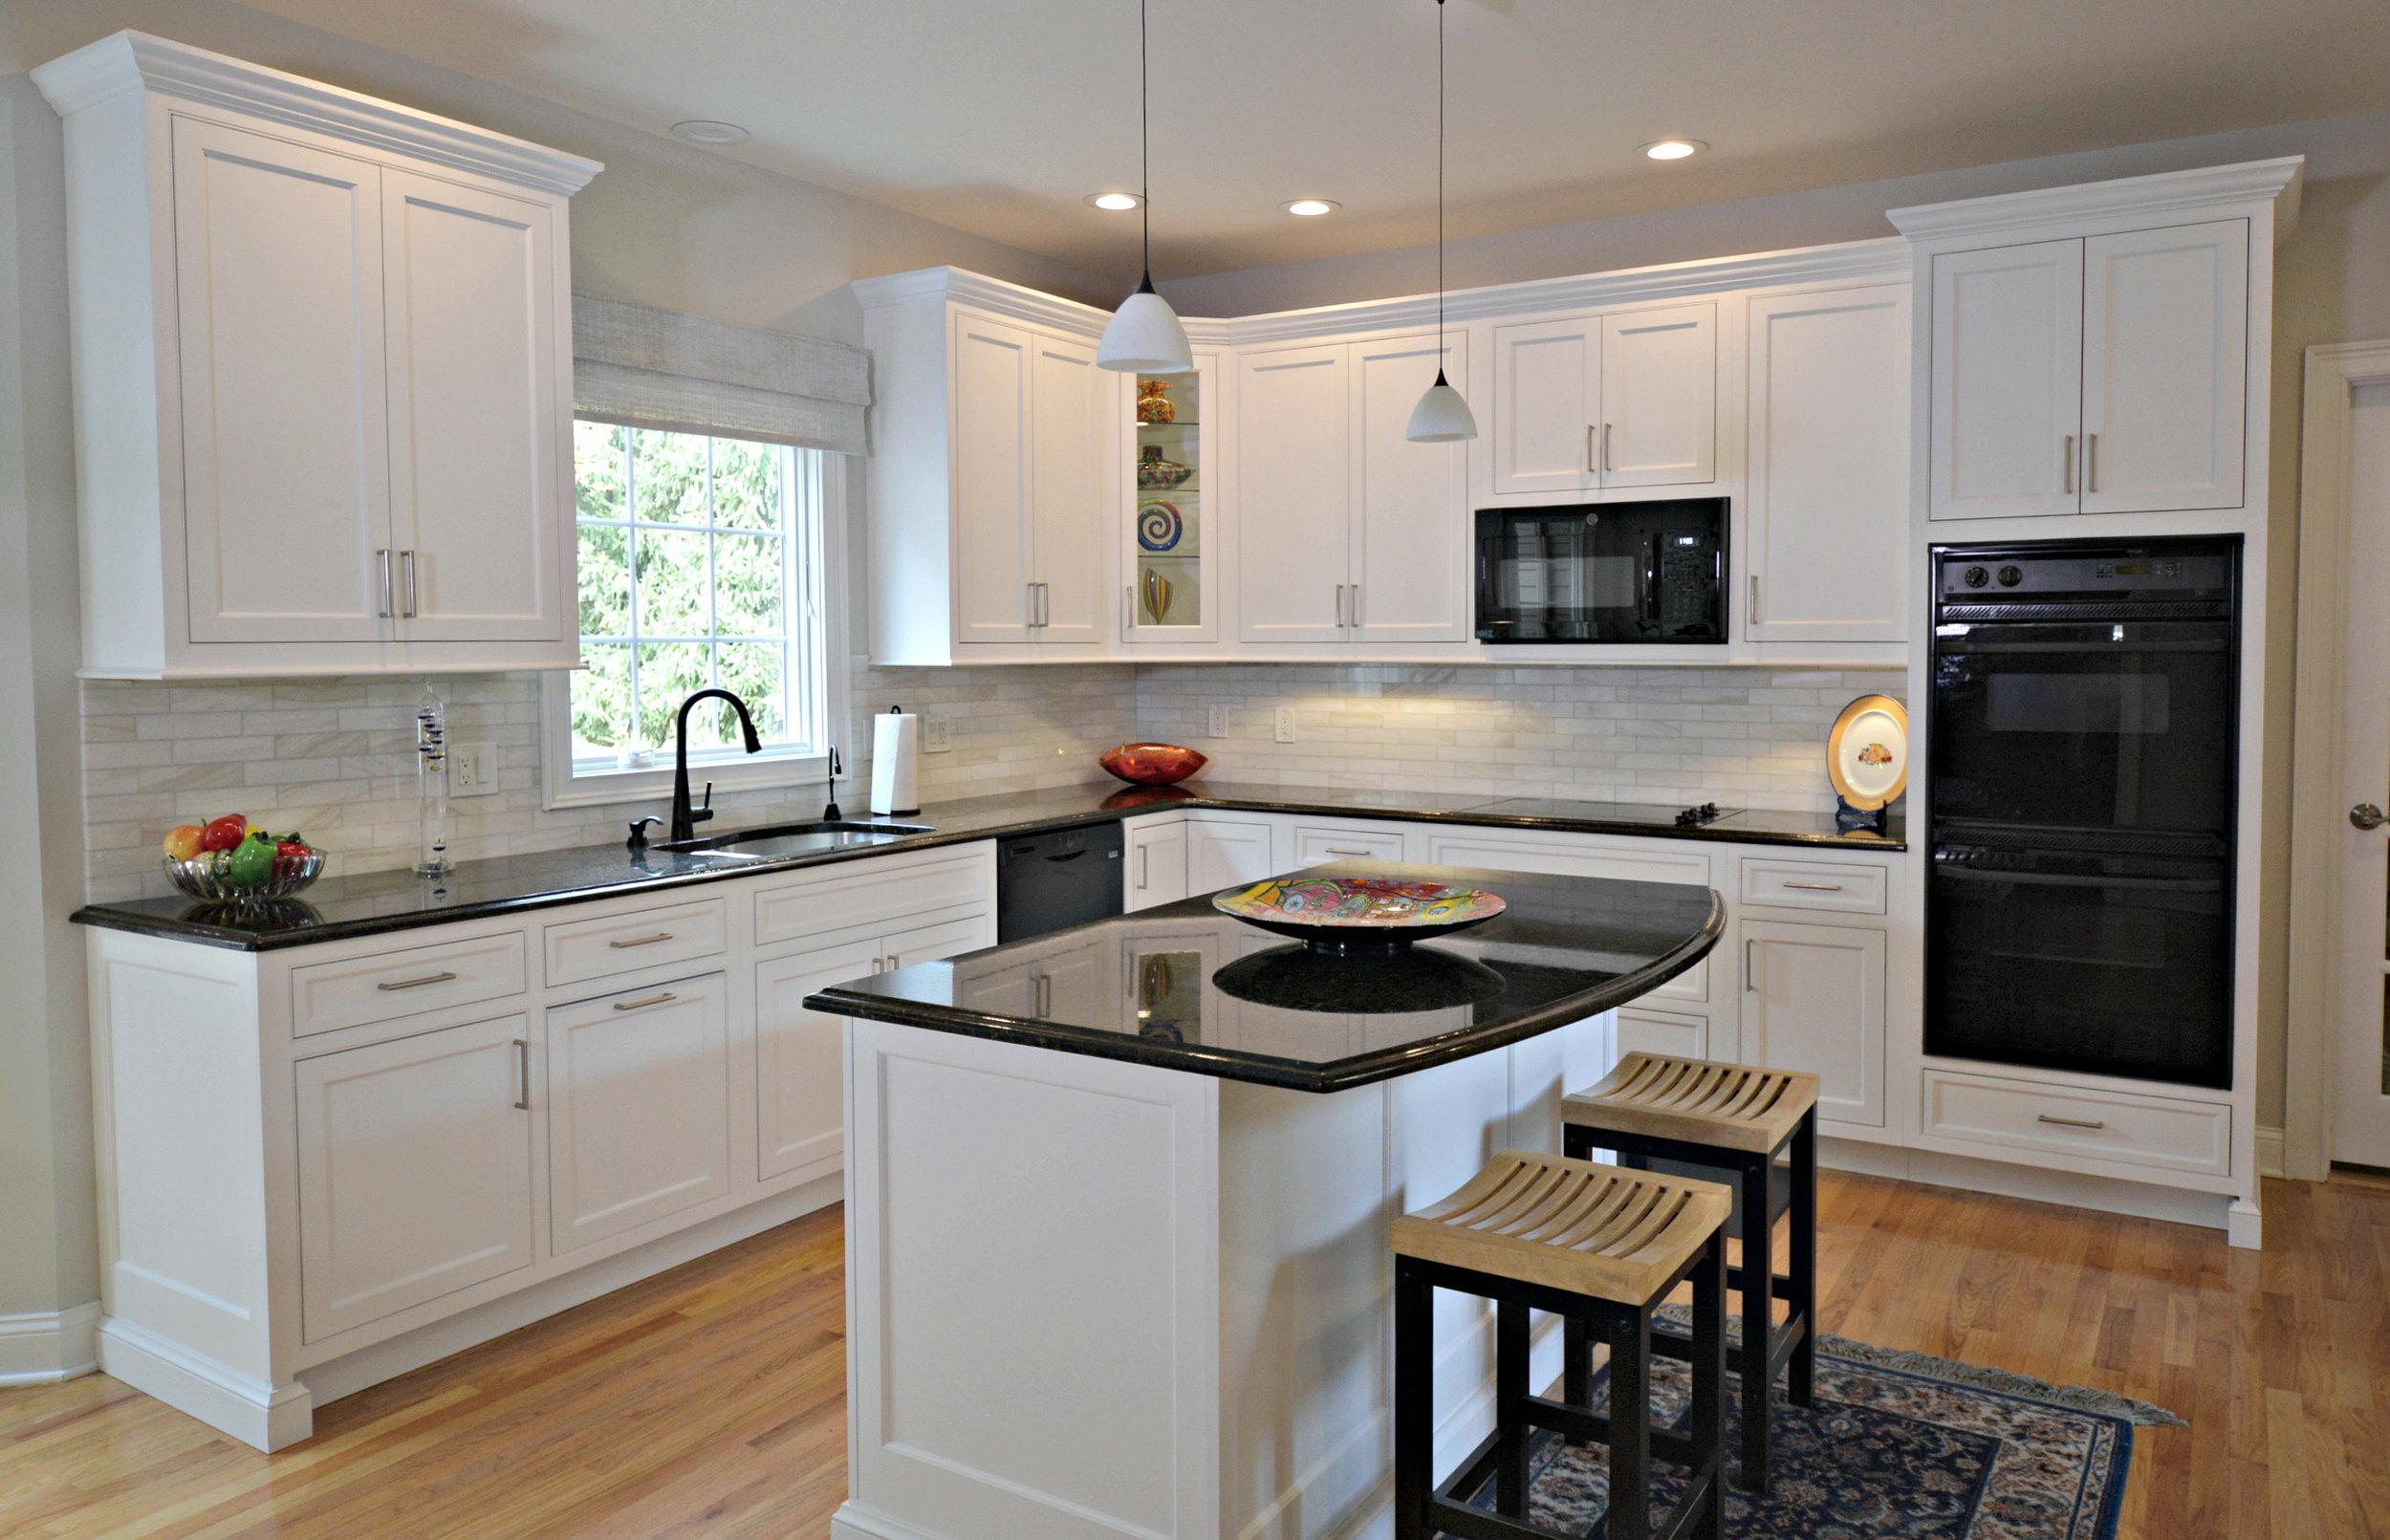 1 White Custom Inset Cabinets.jpg